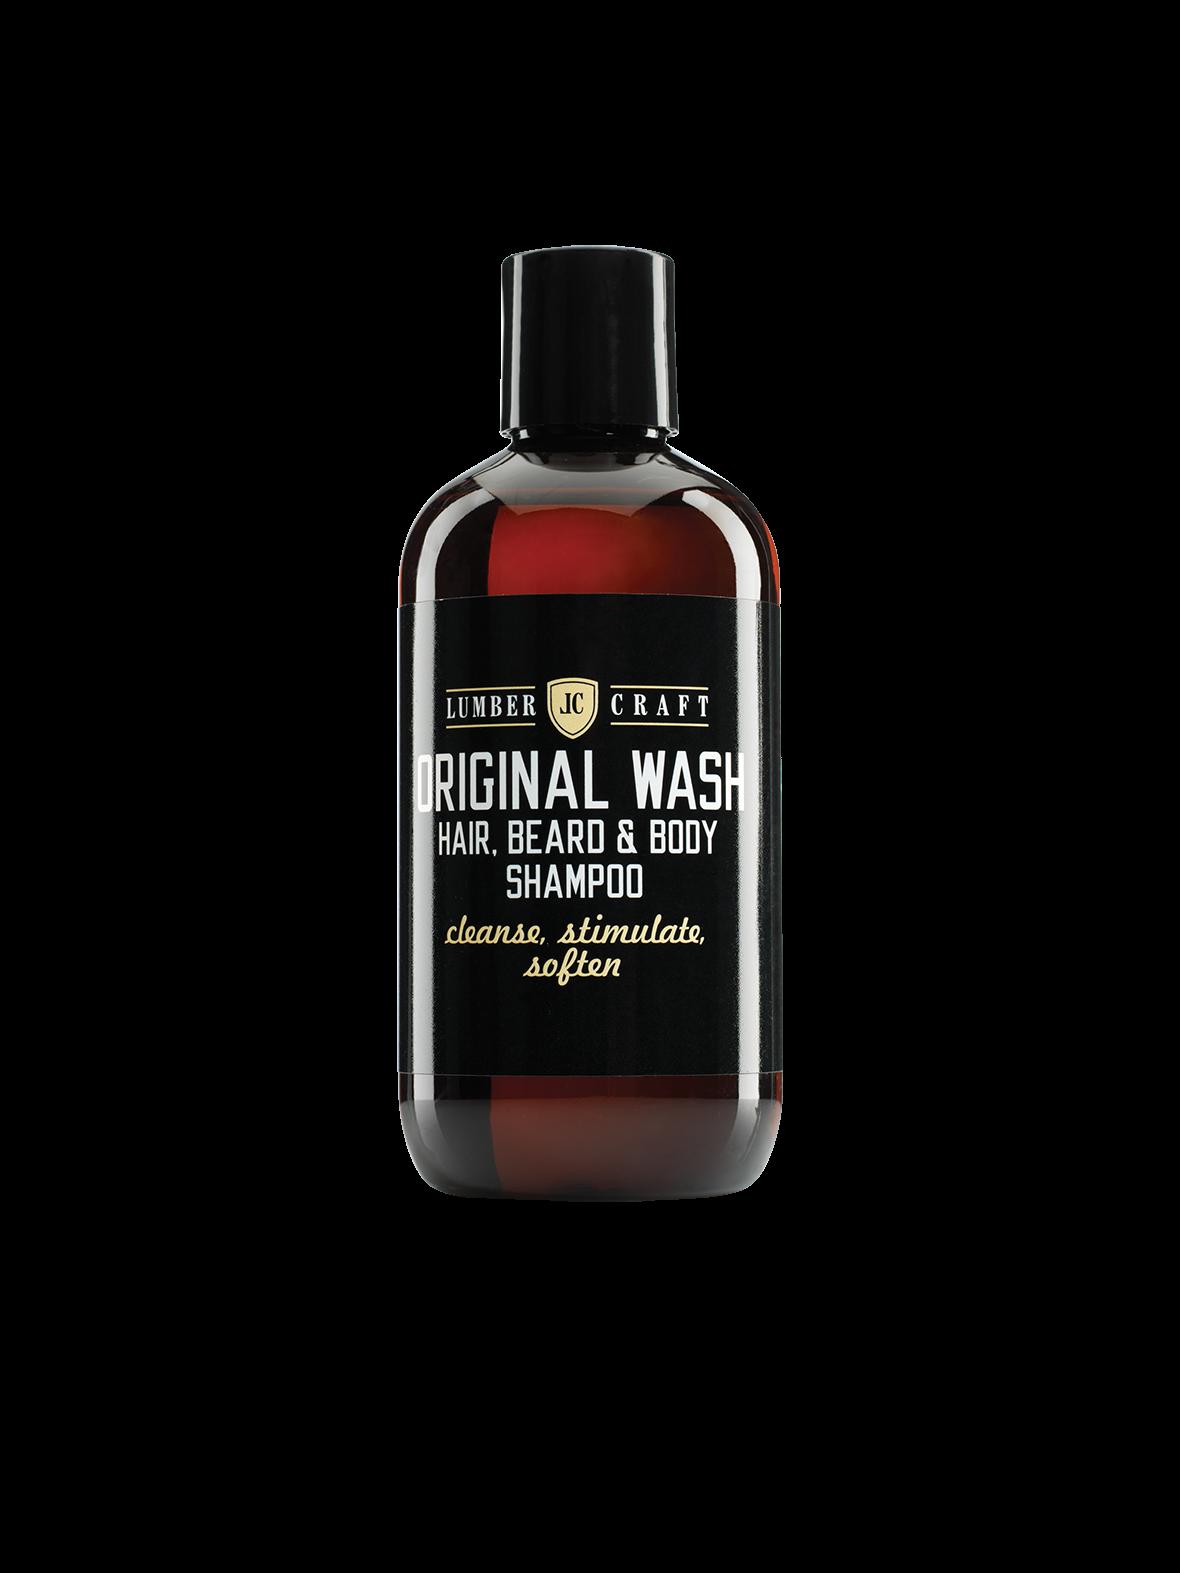 Lumber Craft Wash Shampoo - šampon na vlasy, vousy a tělo 250 ml Subrina